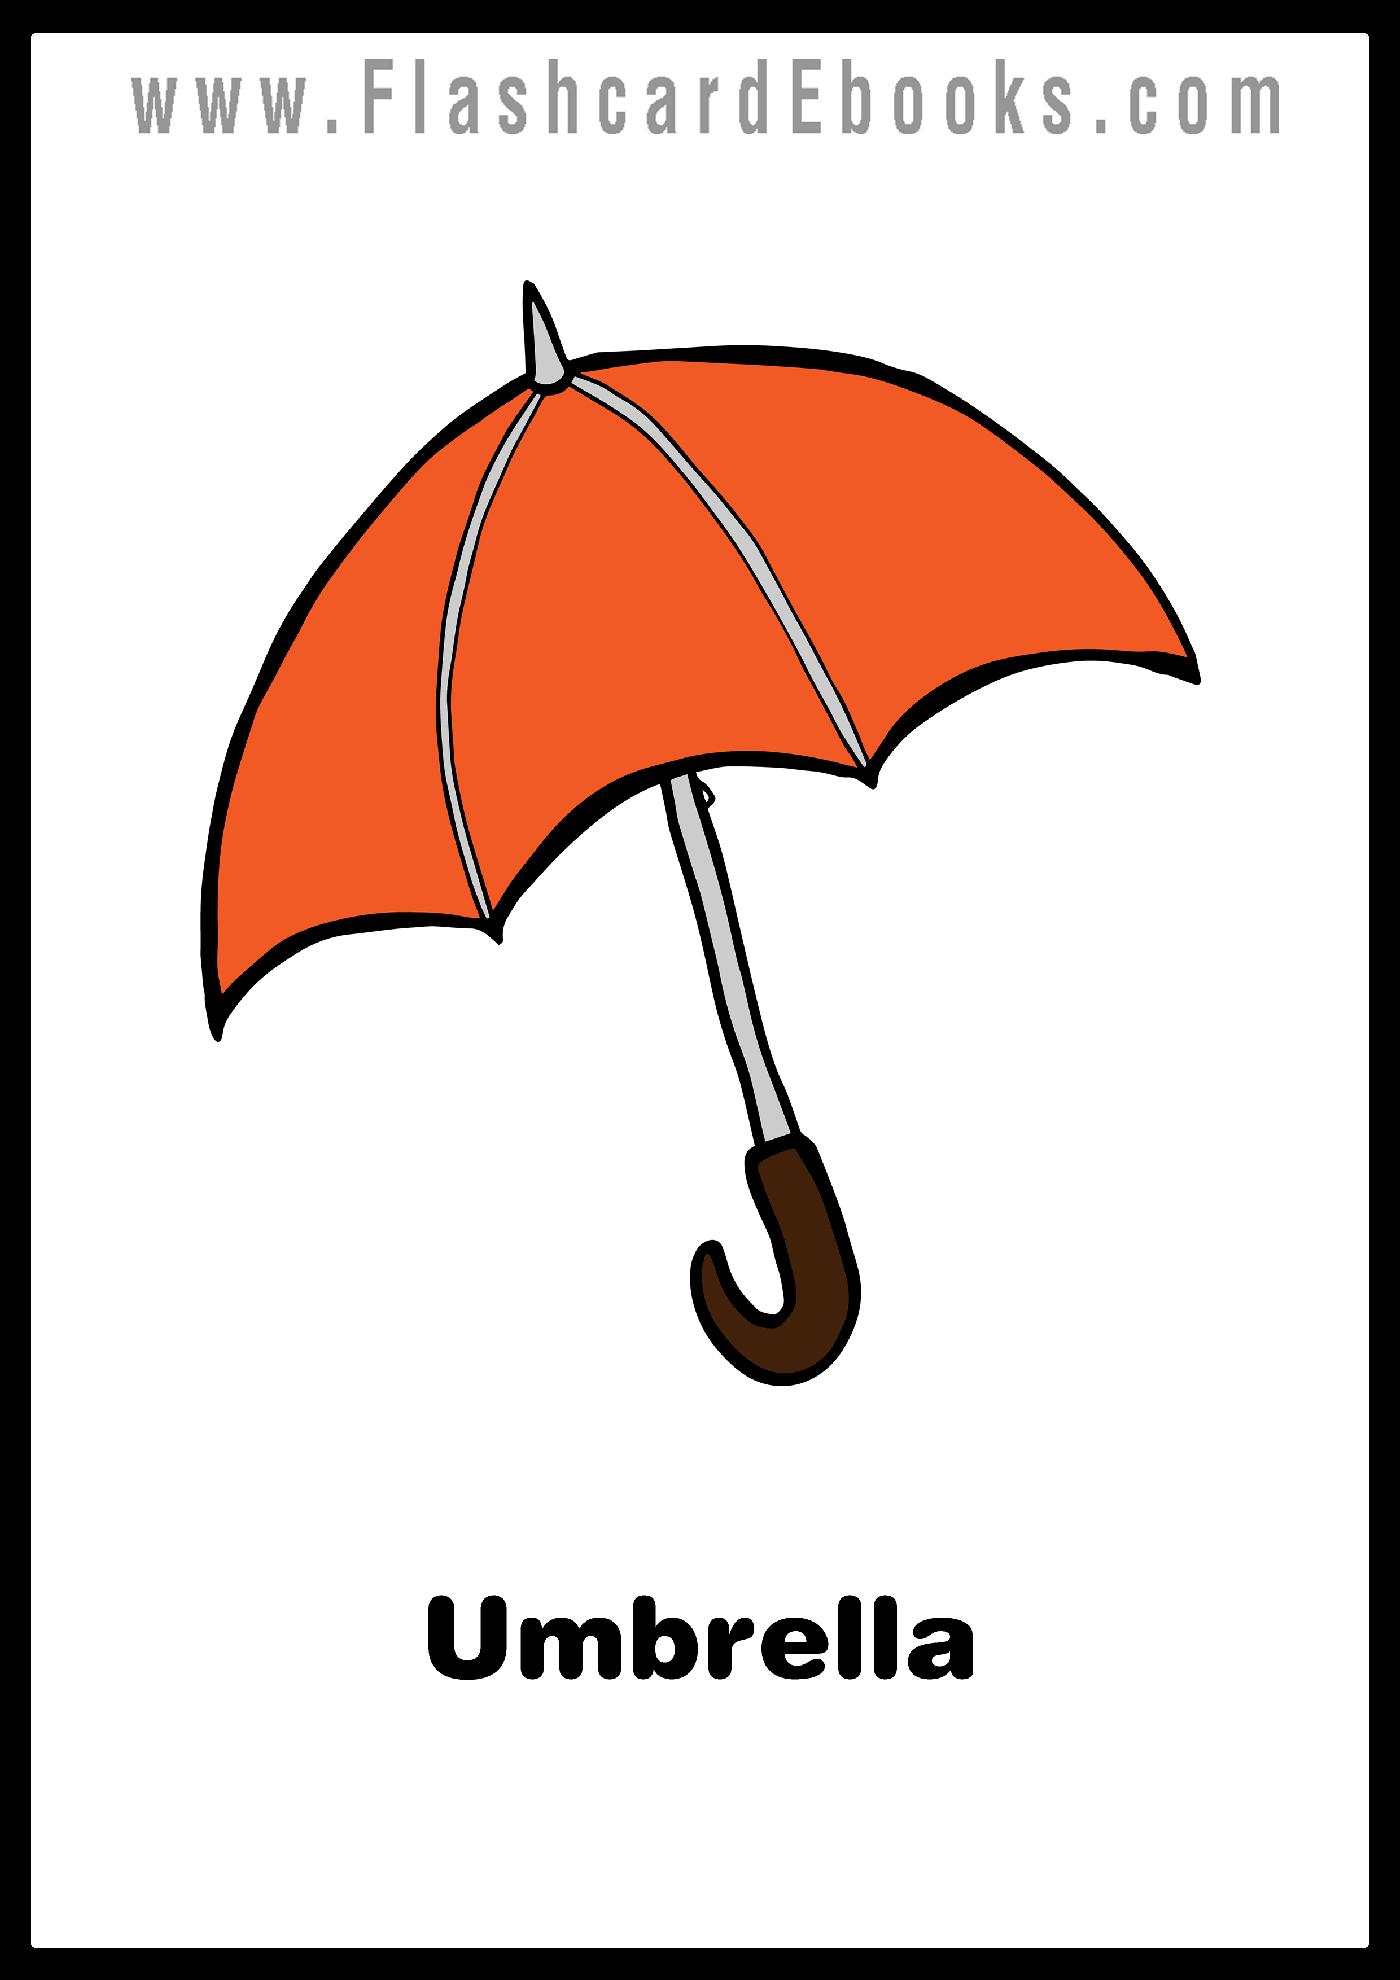 English Flashcard Kindle Umbrella